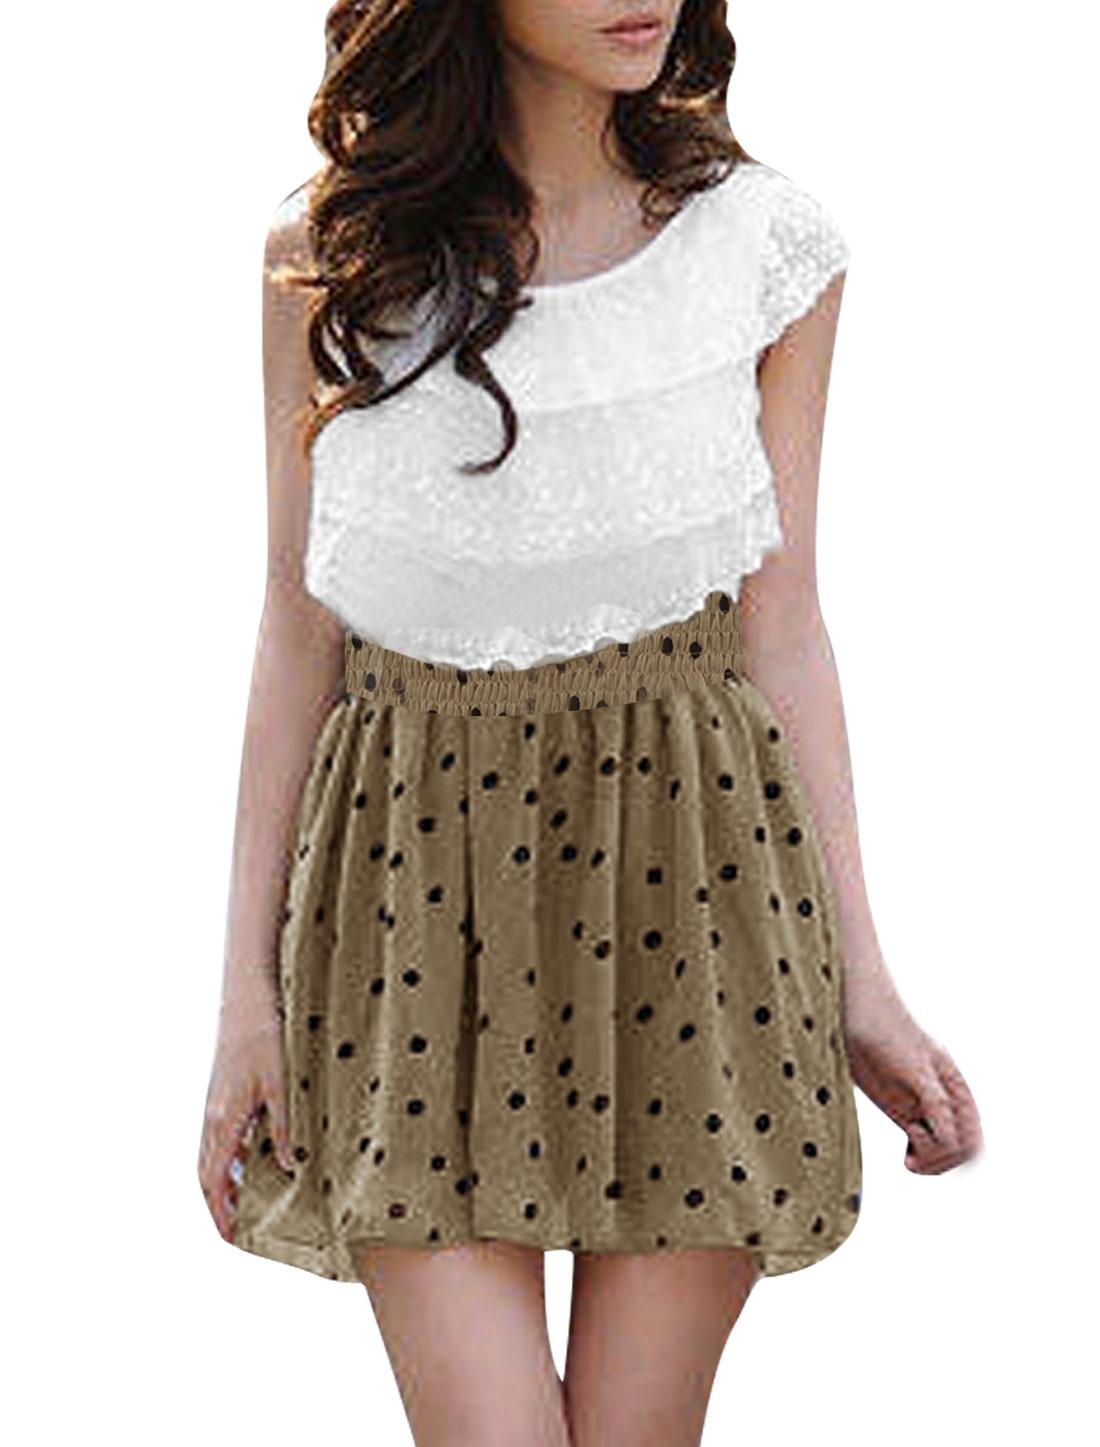 Ladies Sleeveless Style Round Neck Panel Pullover Dress XS Whtie Khaki